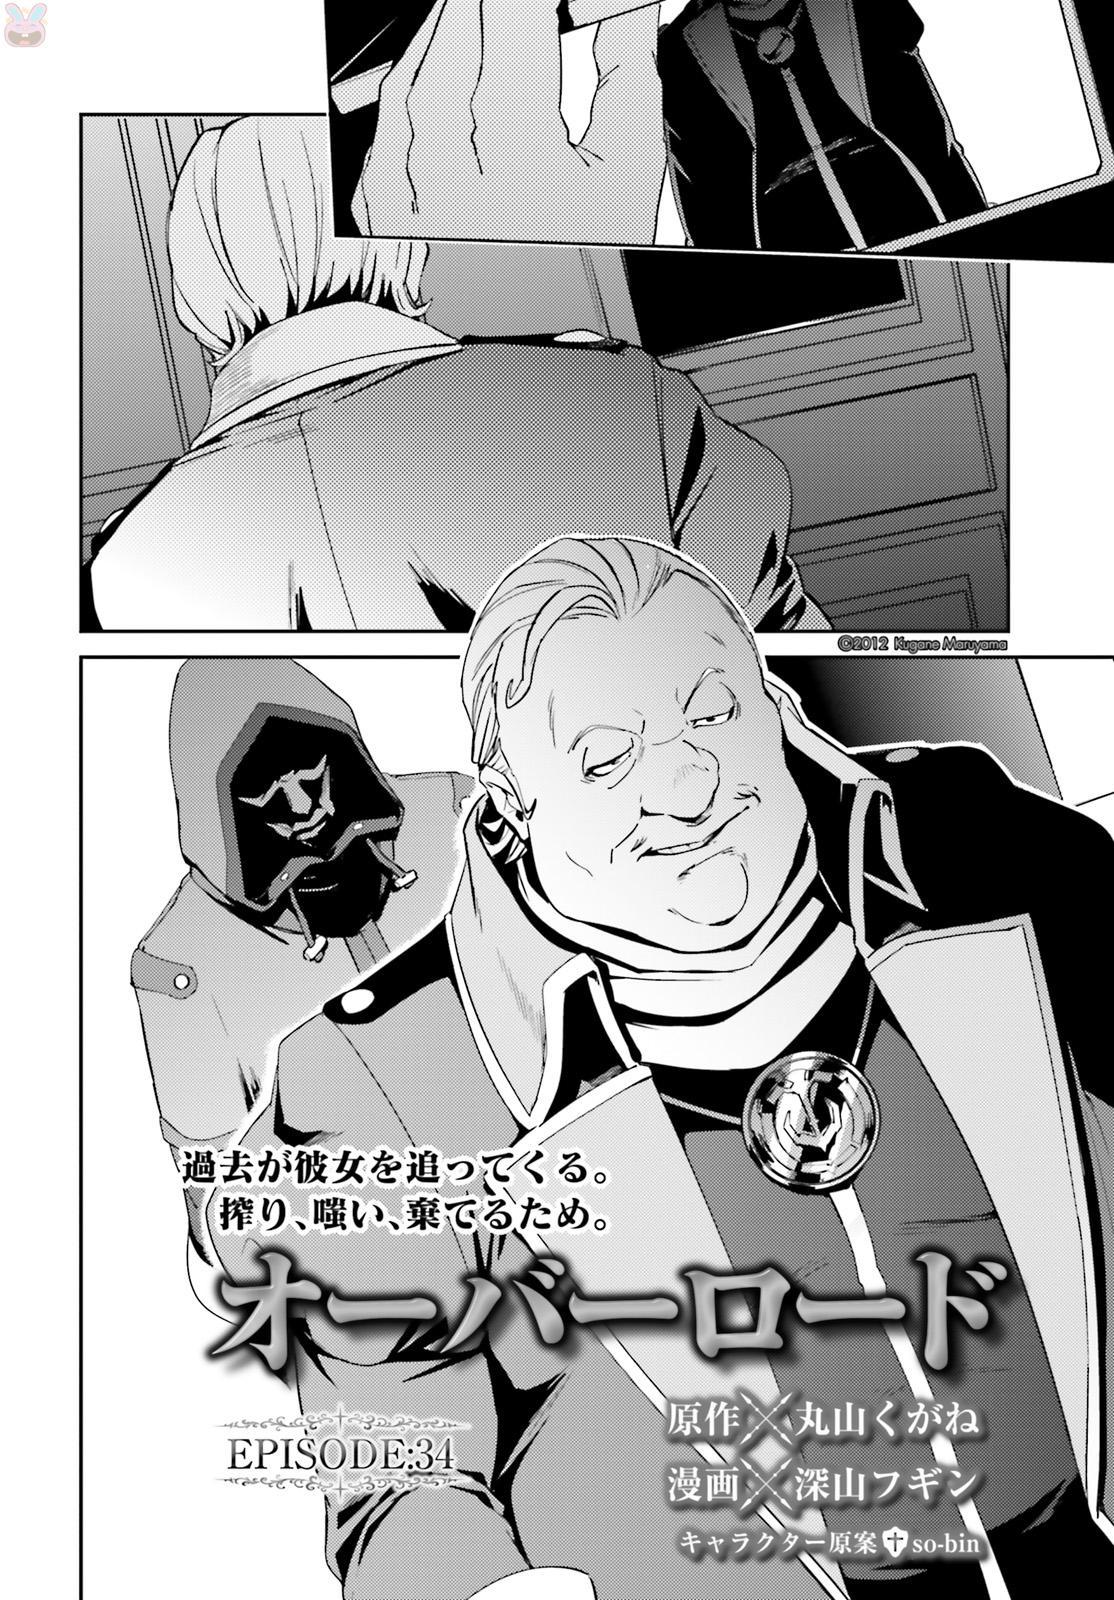 Overlord Manga Chapter 34